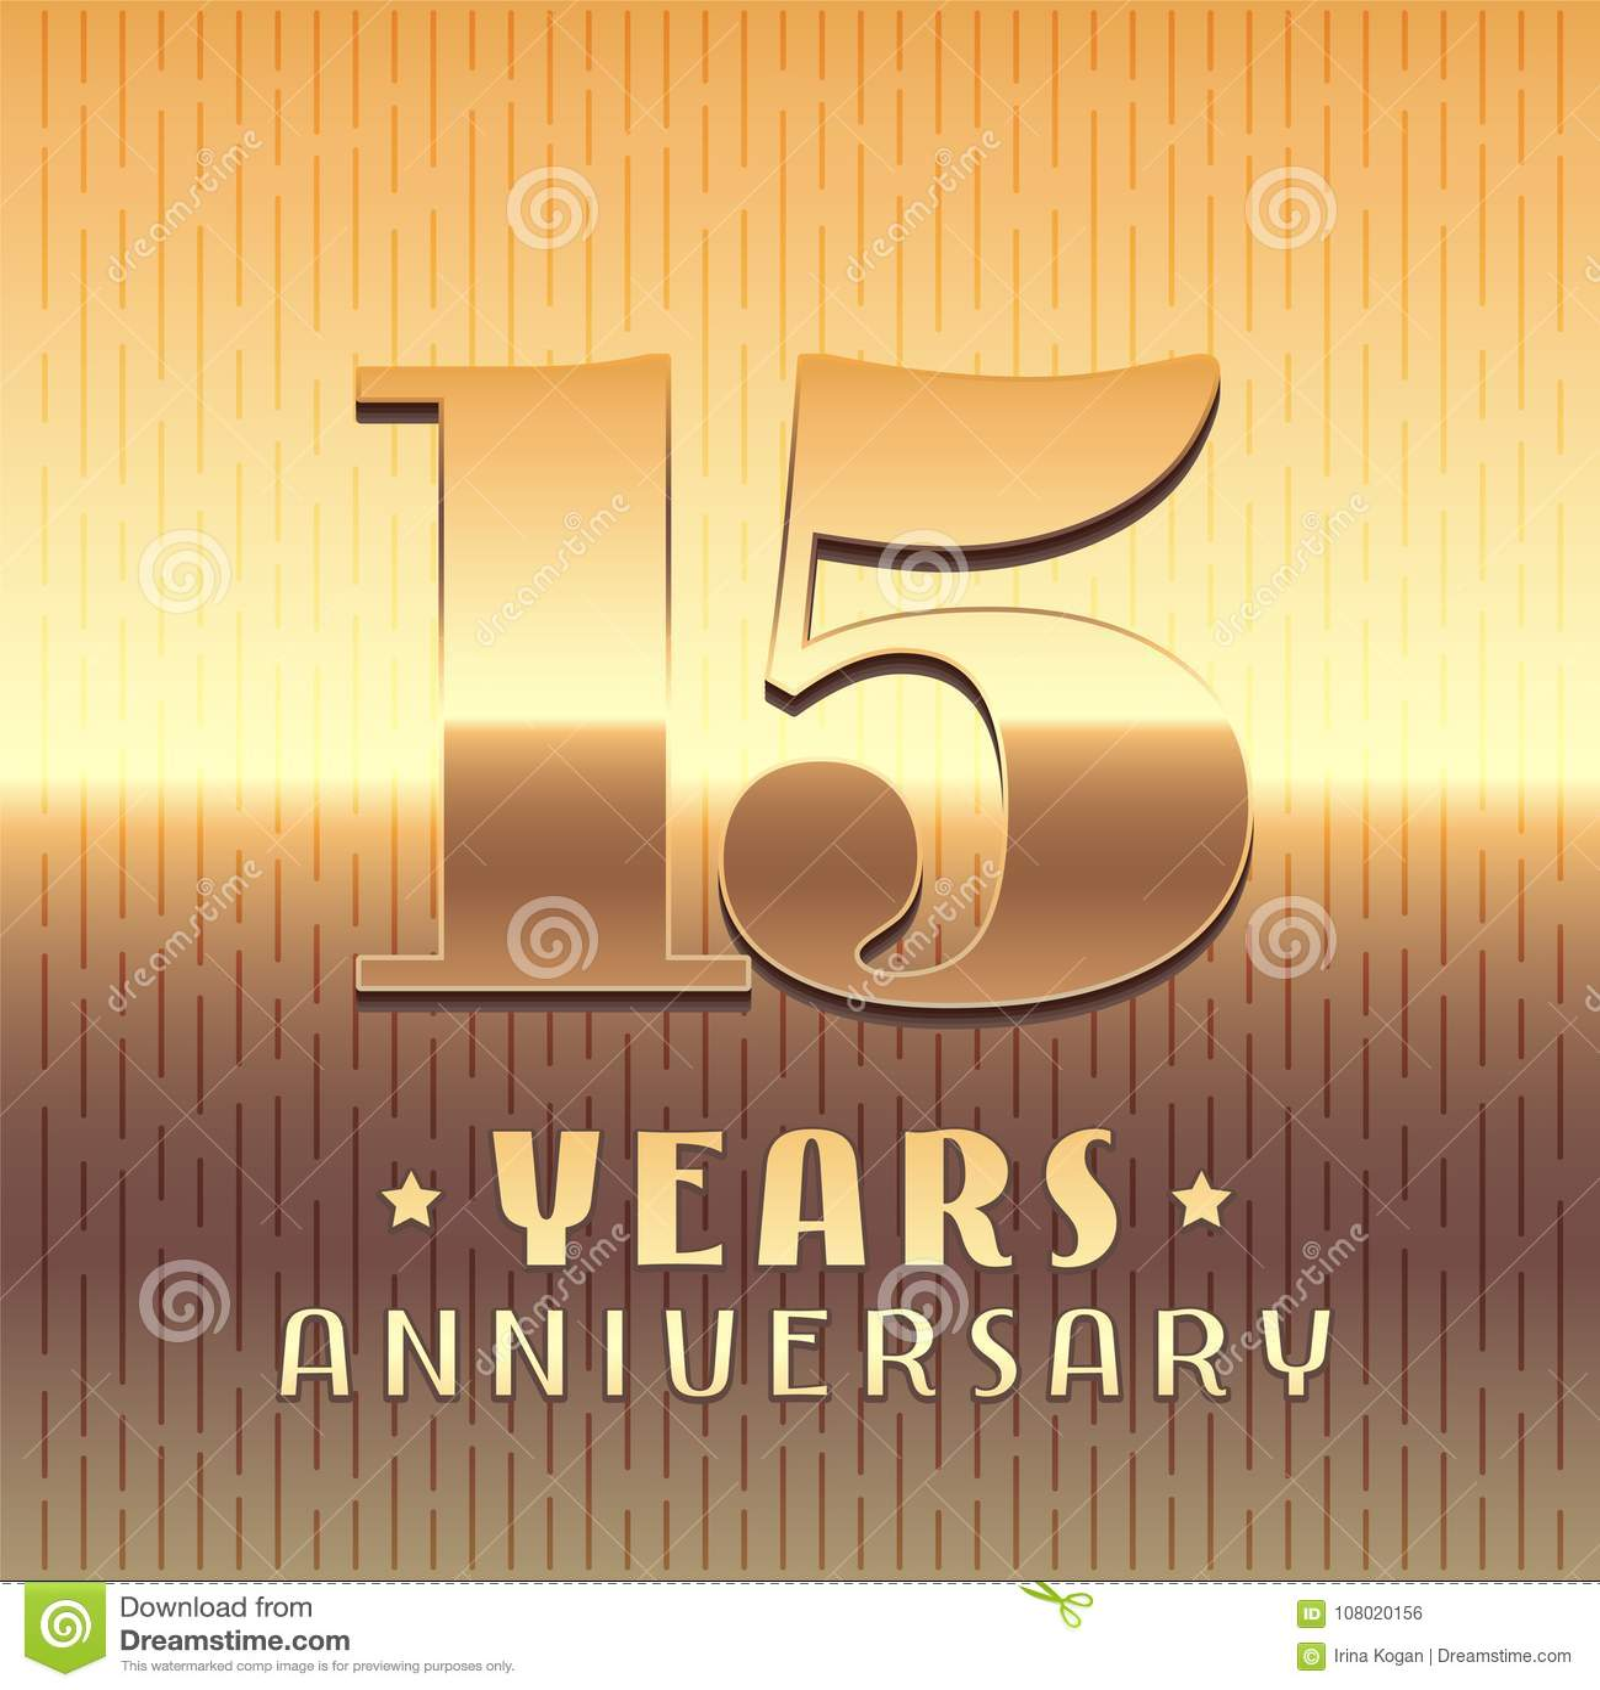 15 Years Anniversary Vector Icon Symbol Stock Vector Illustration